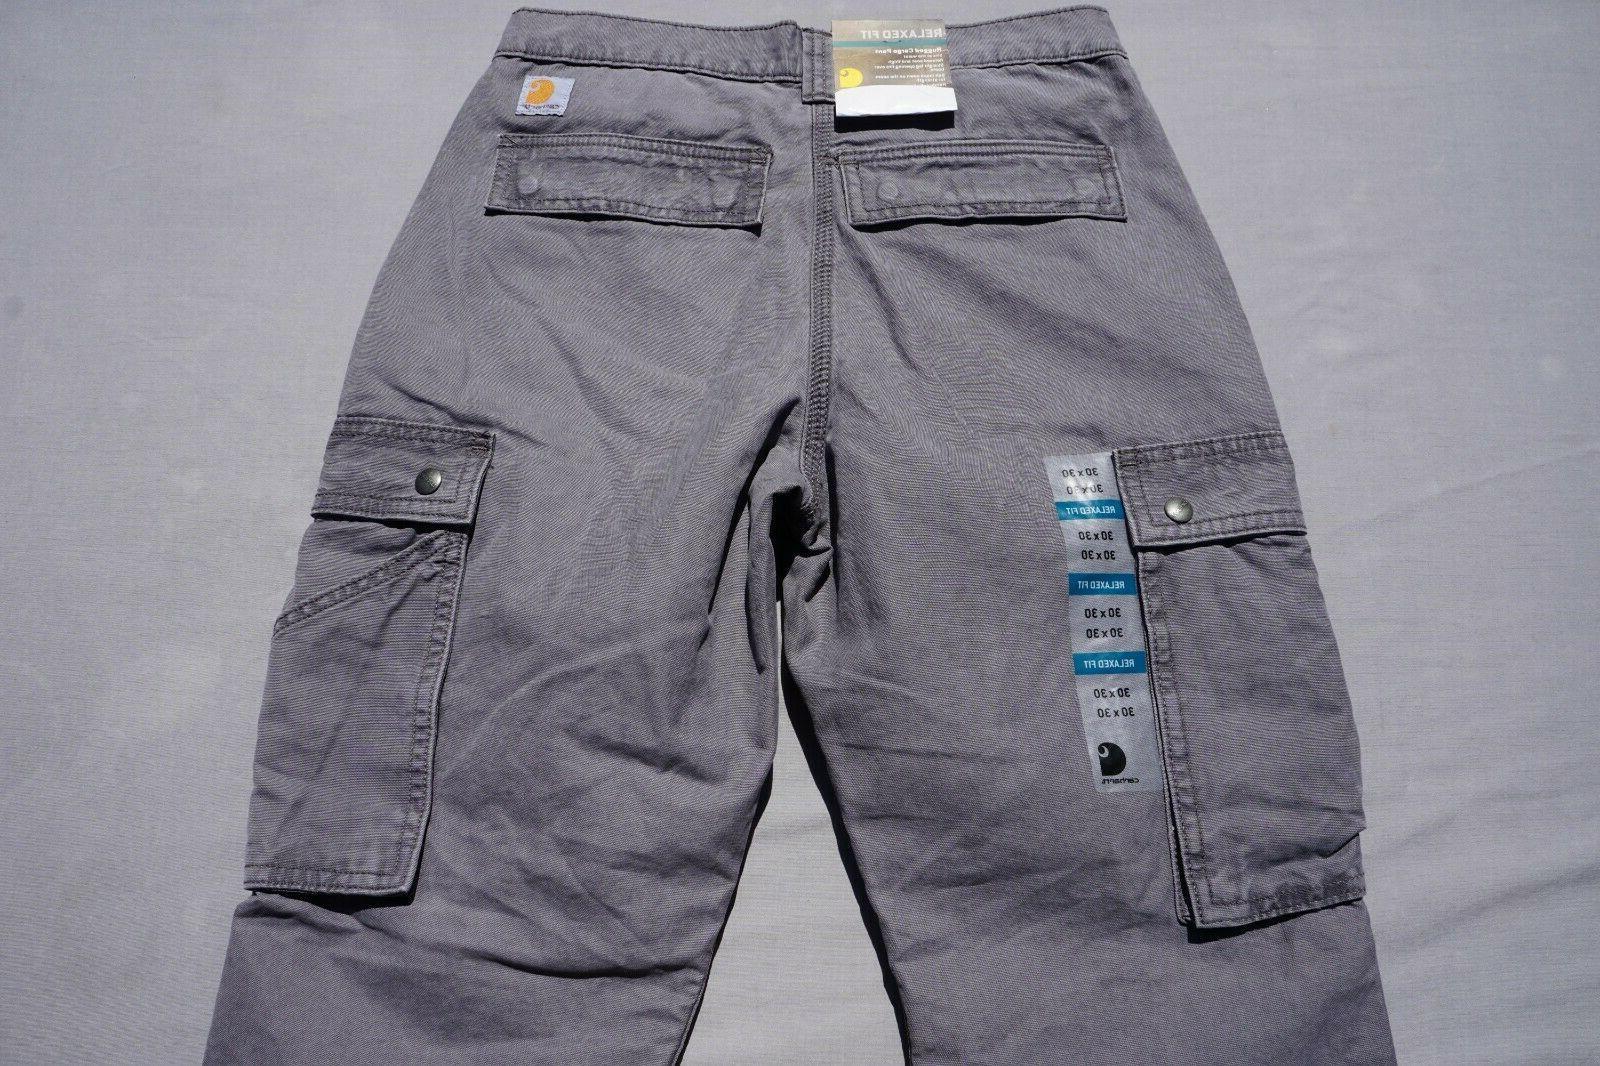 Carhartt Cotton 'Rugged Cargo Pant'. Gray, 30X30.